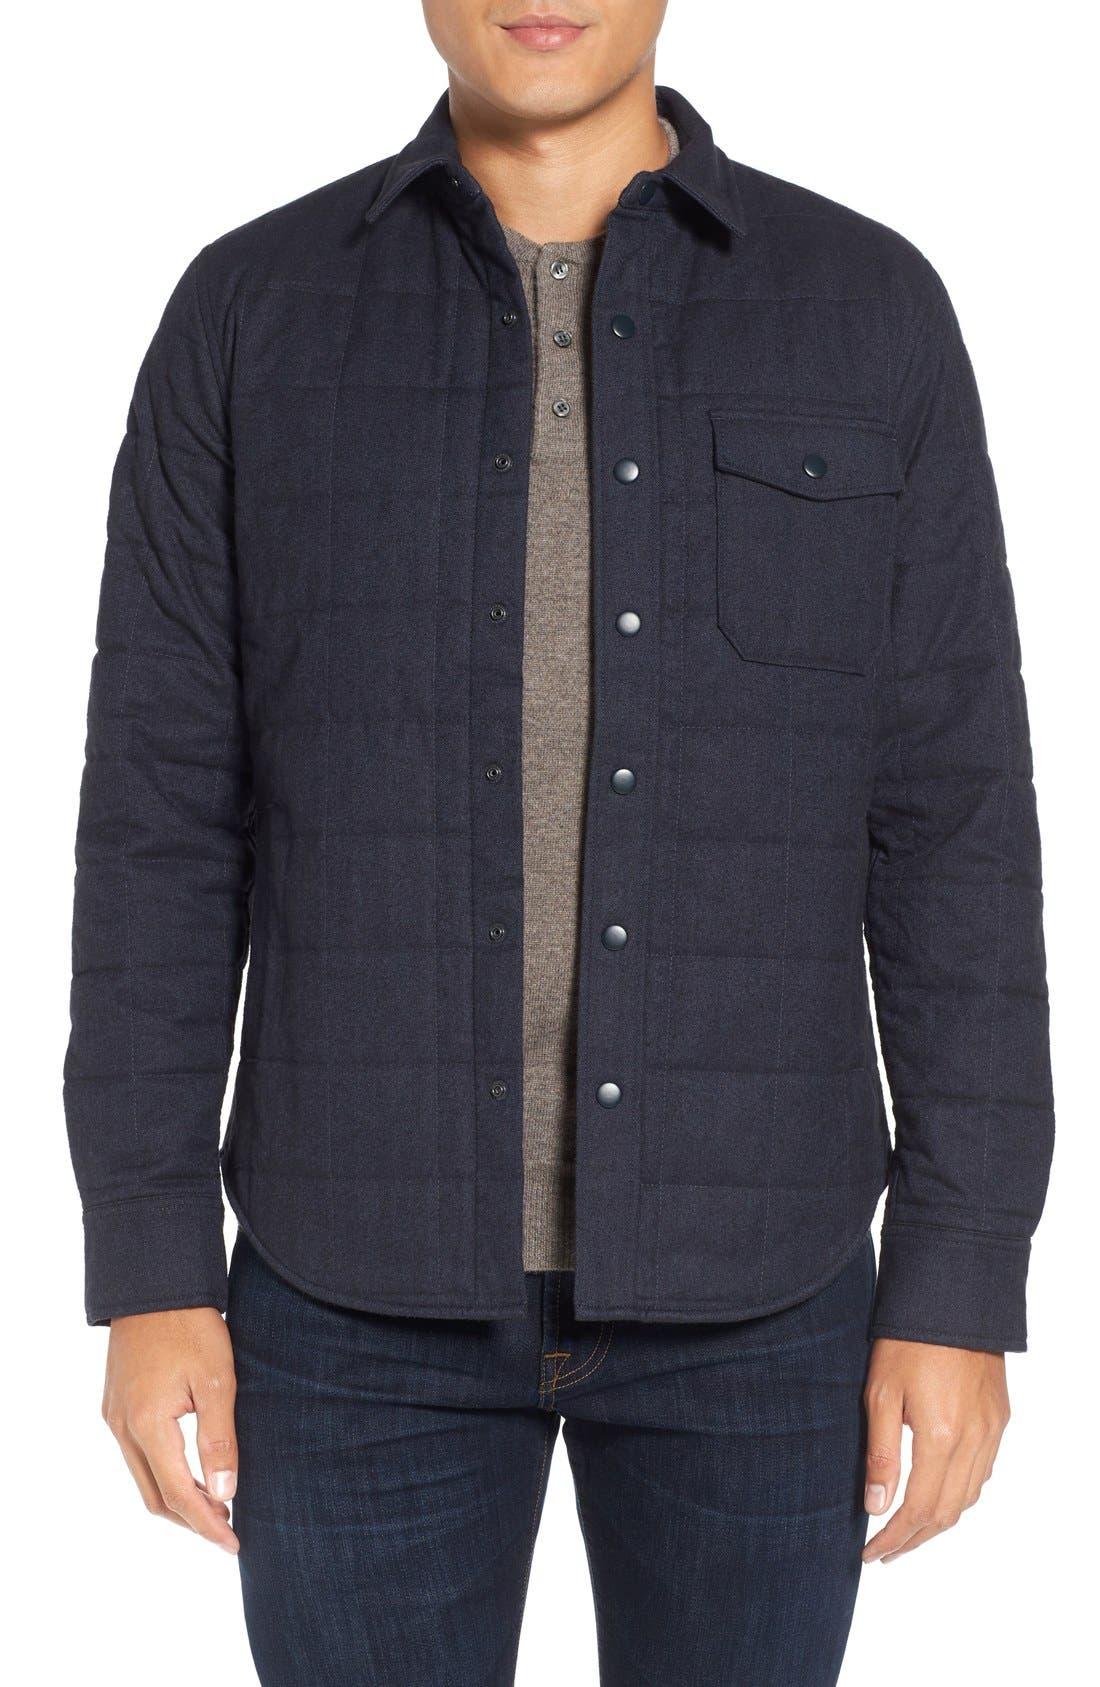 Main Image - Bonobos Quilted Herringbone Shirt Jacket